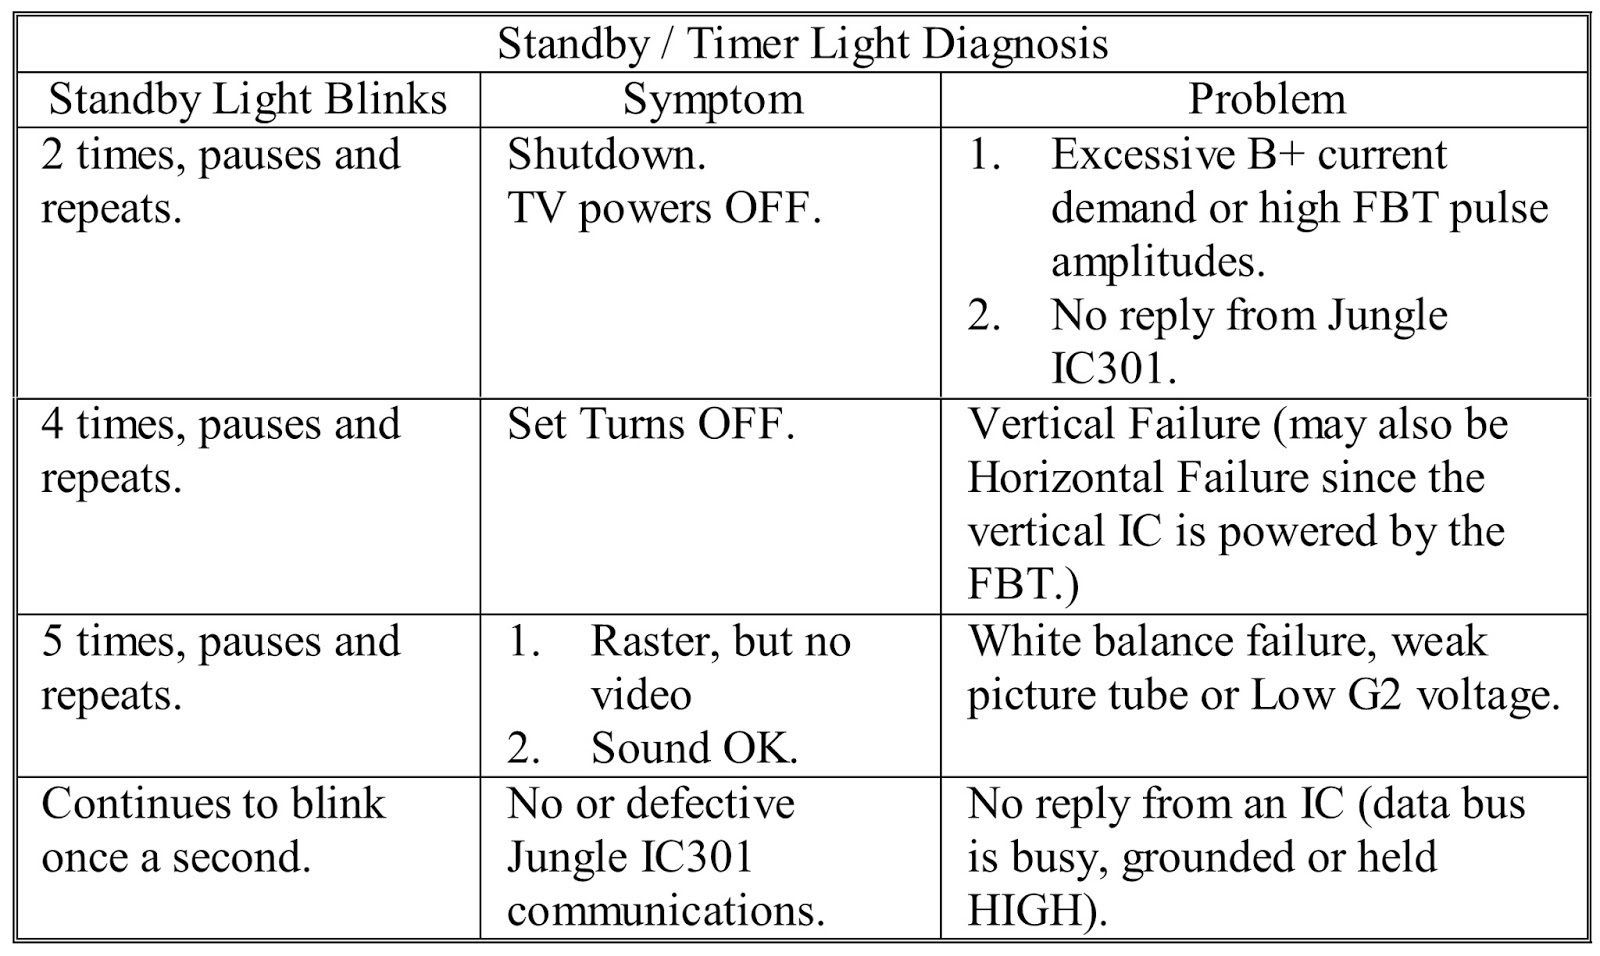 sony trinitron standby light blinking - Video Search ...